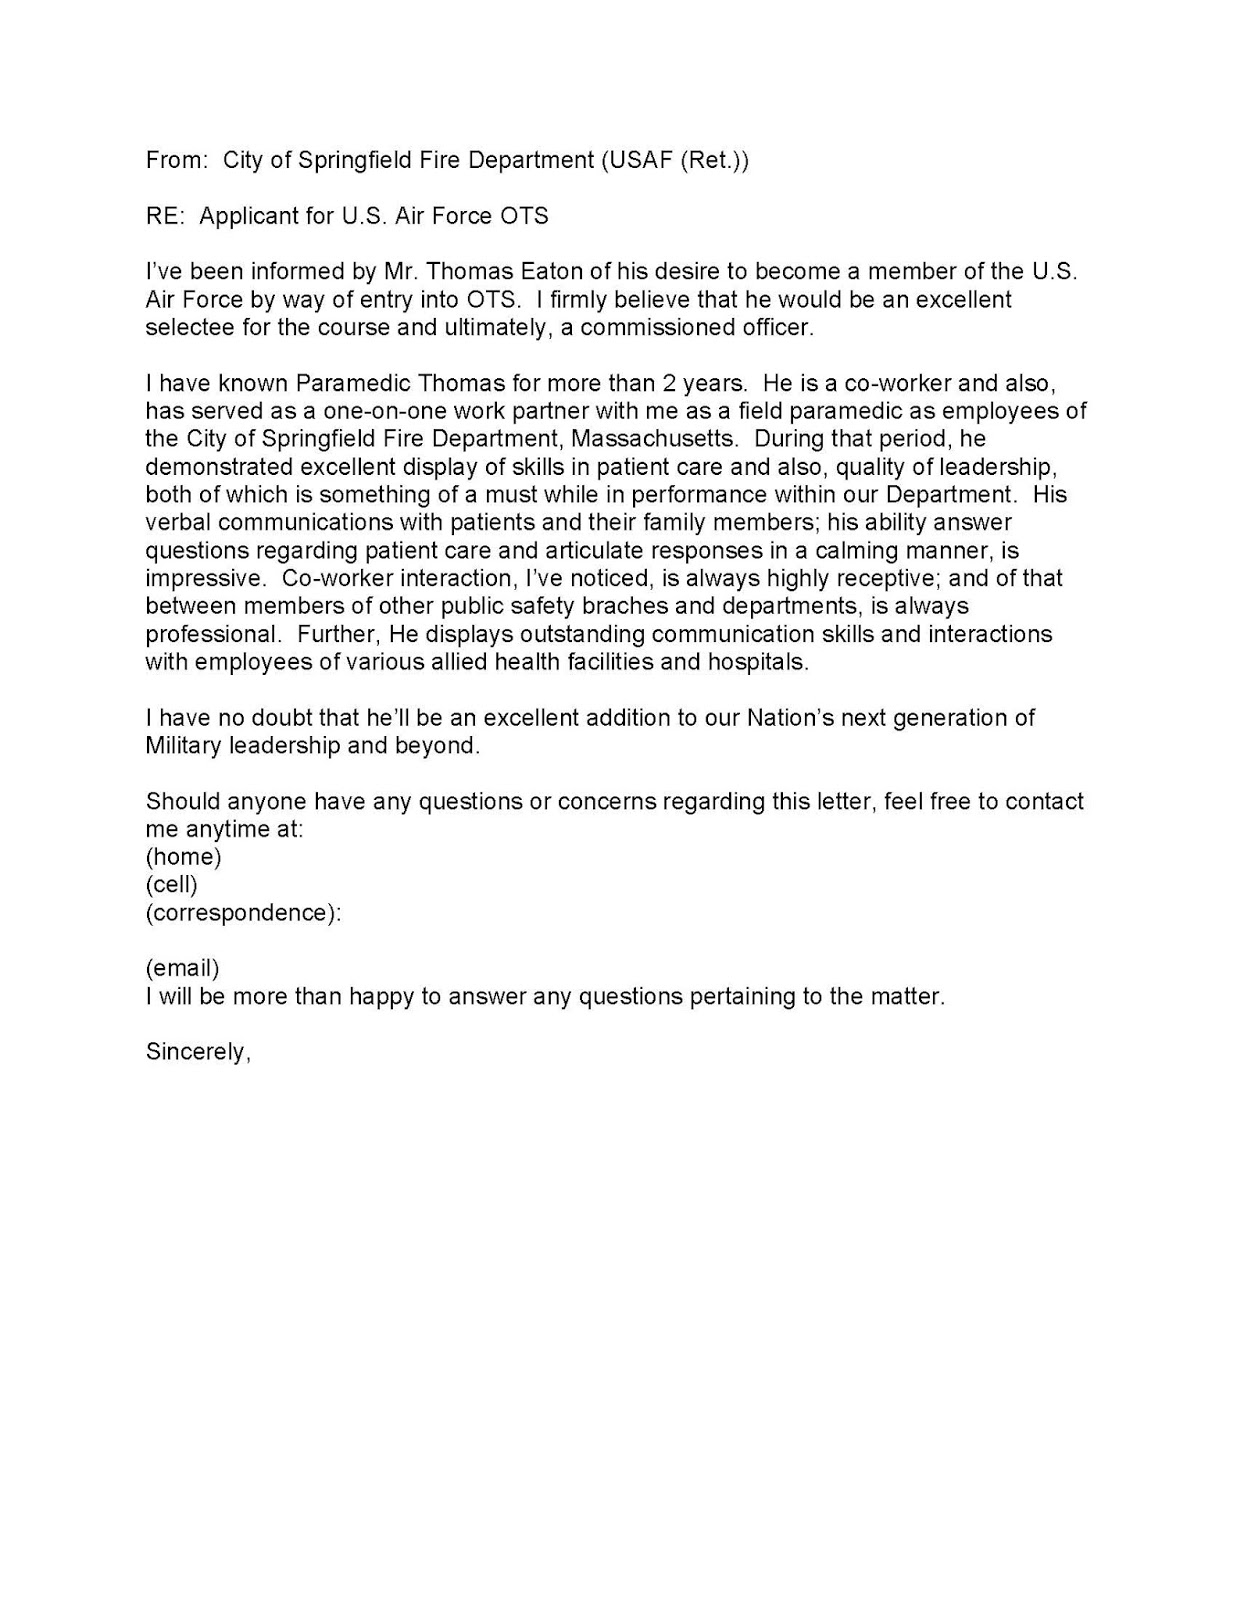 Pilot personal statement